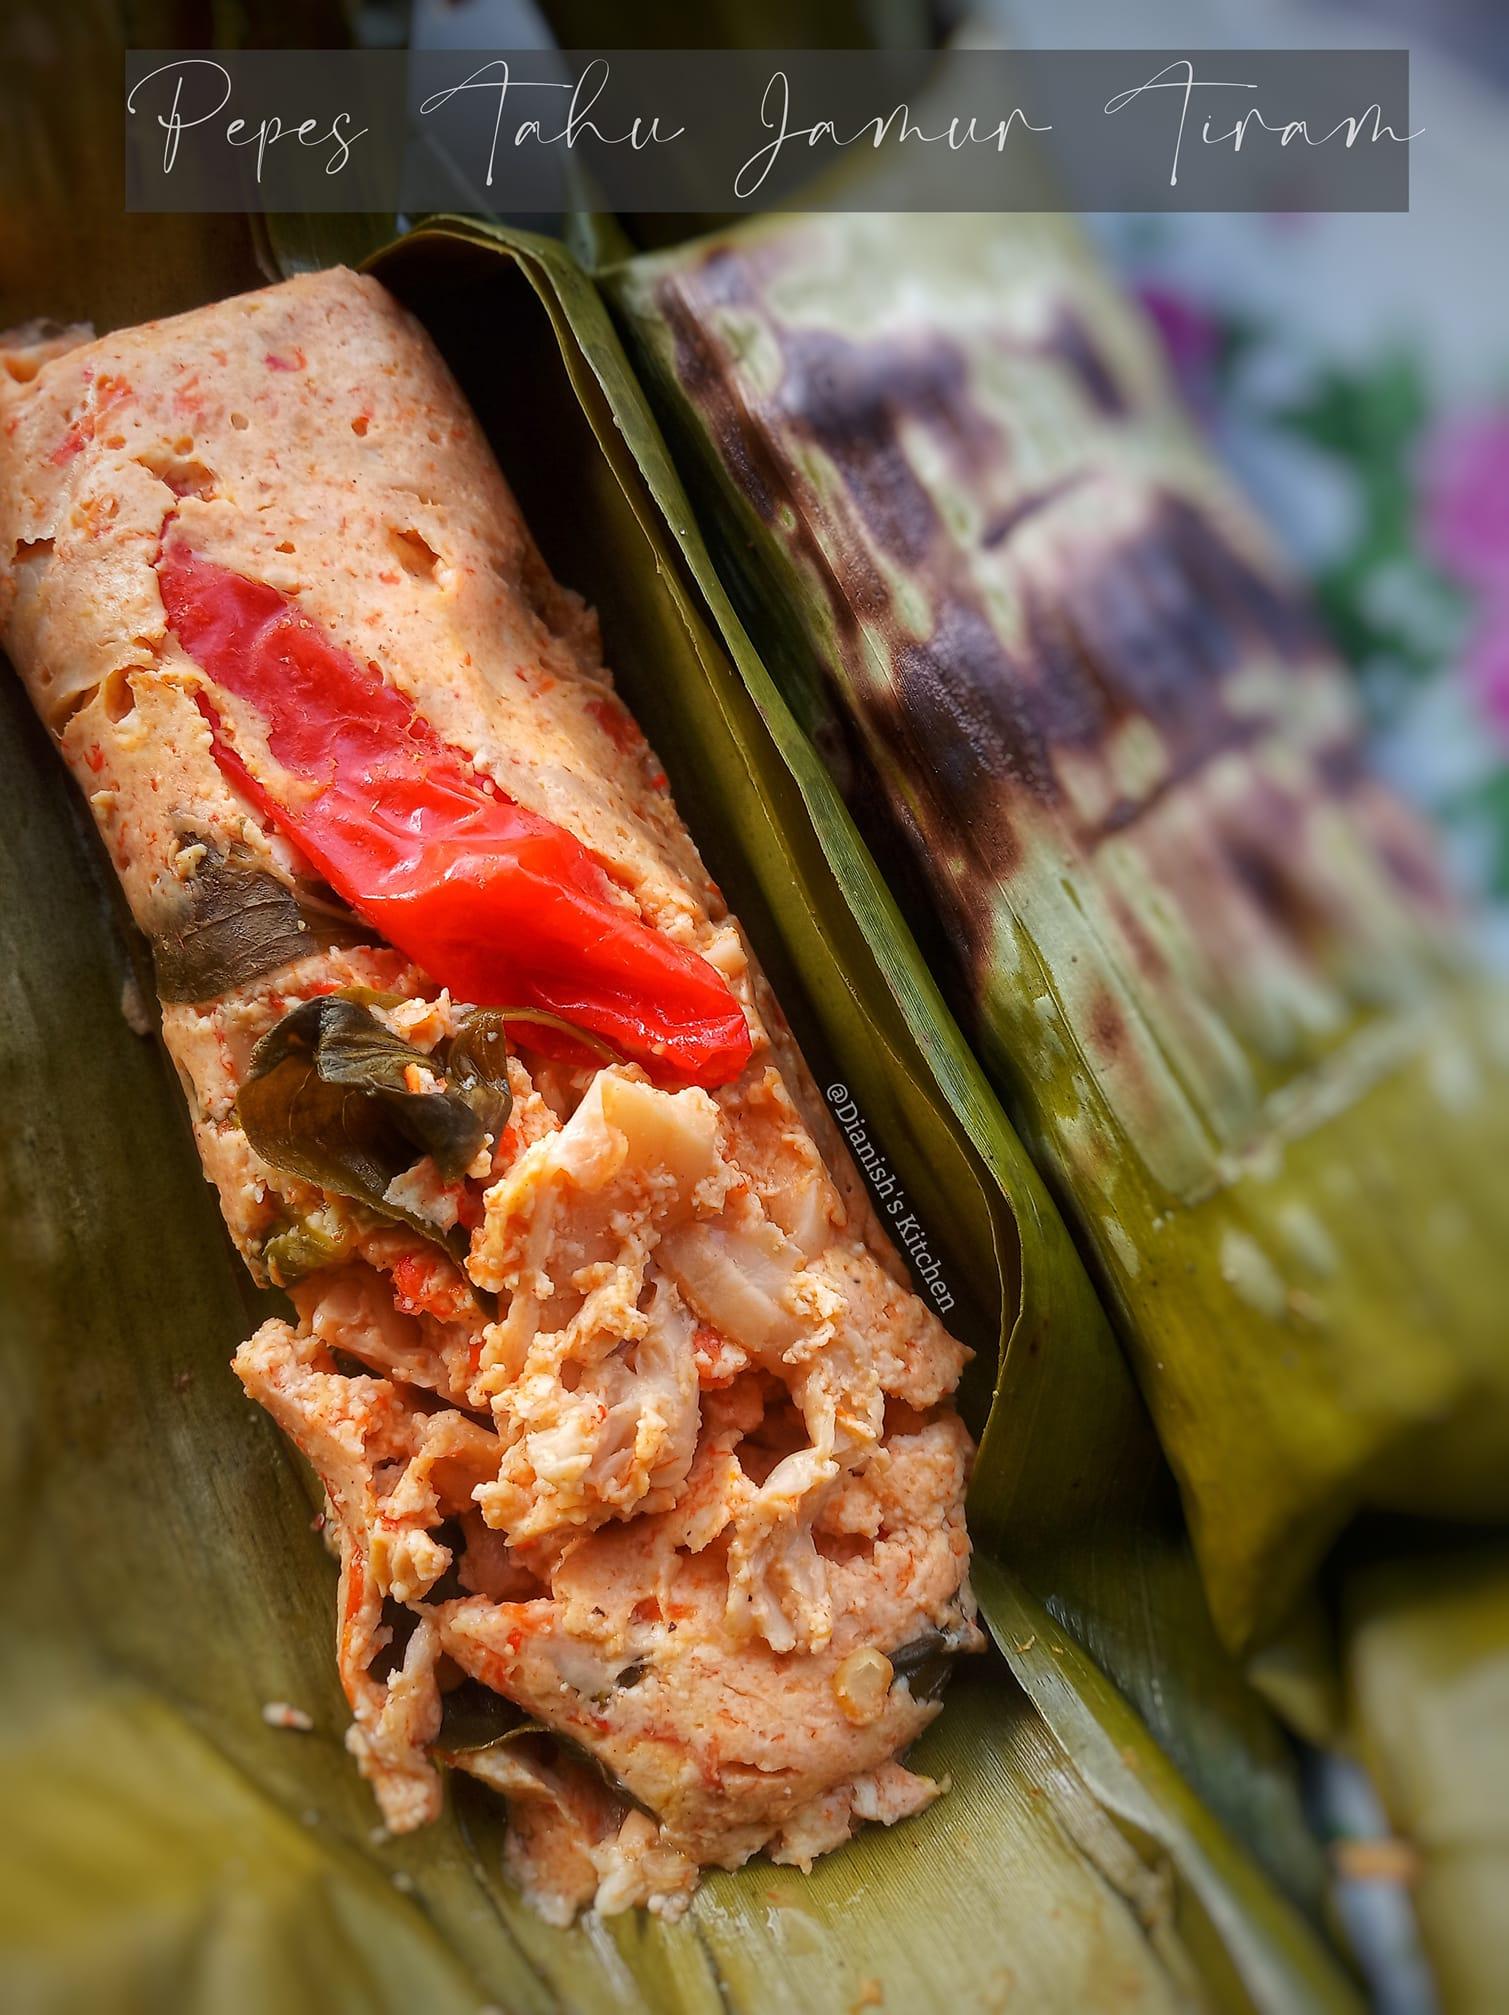 Resep Pepes Jamur Tiram : resep, pepes, jamur, tiram, Recipe, PEPES, JAMUR, TIRAM, Dianish's, Kitchen